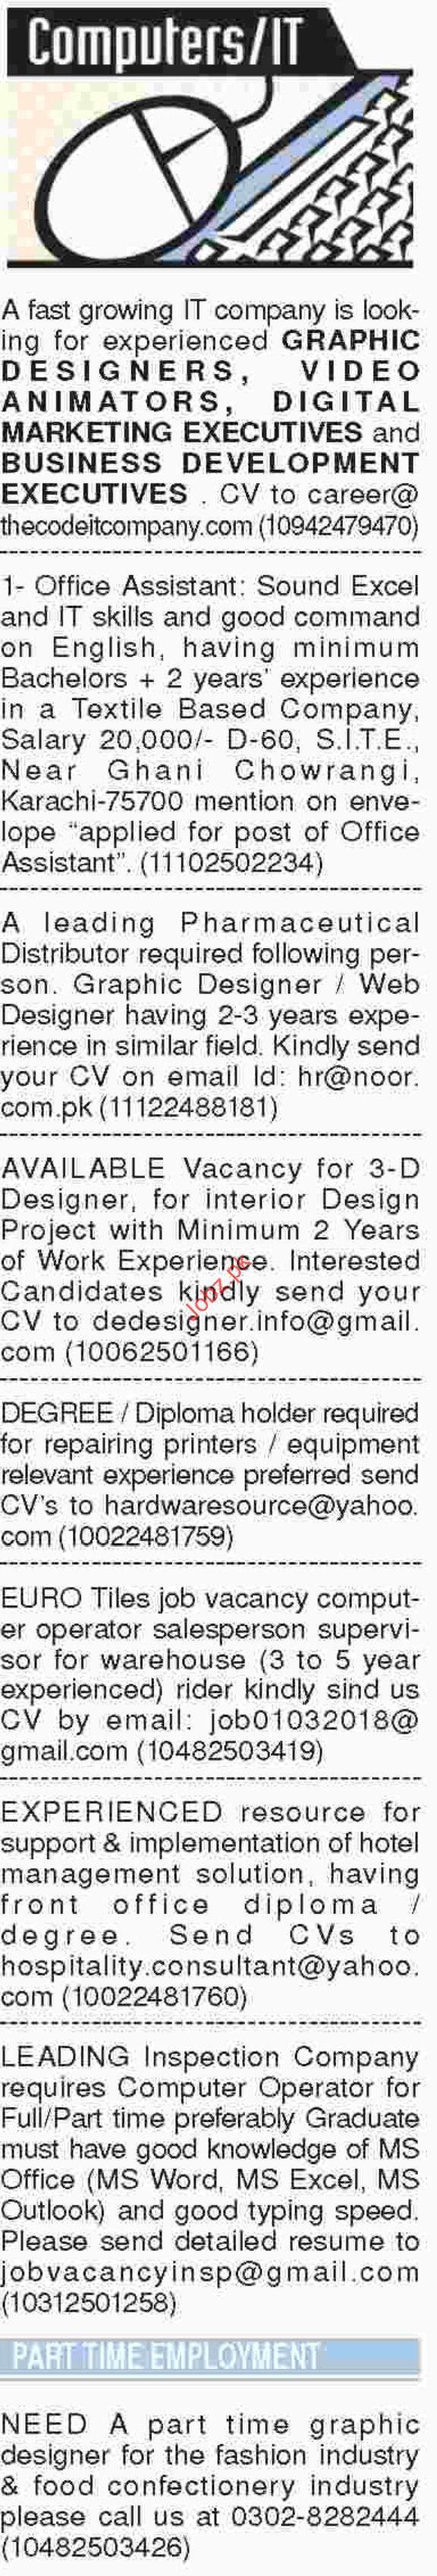 Graphic Designer Jobs in IT Company